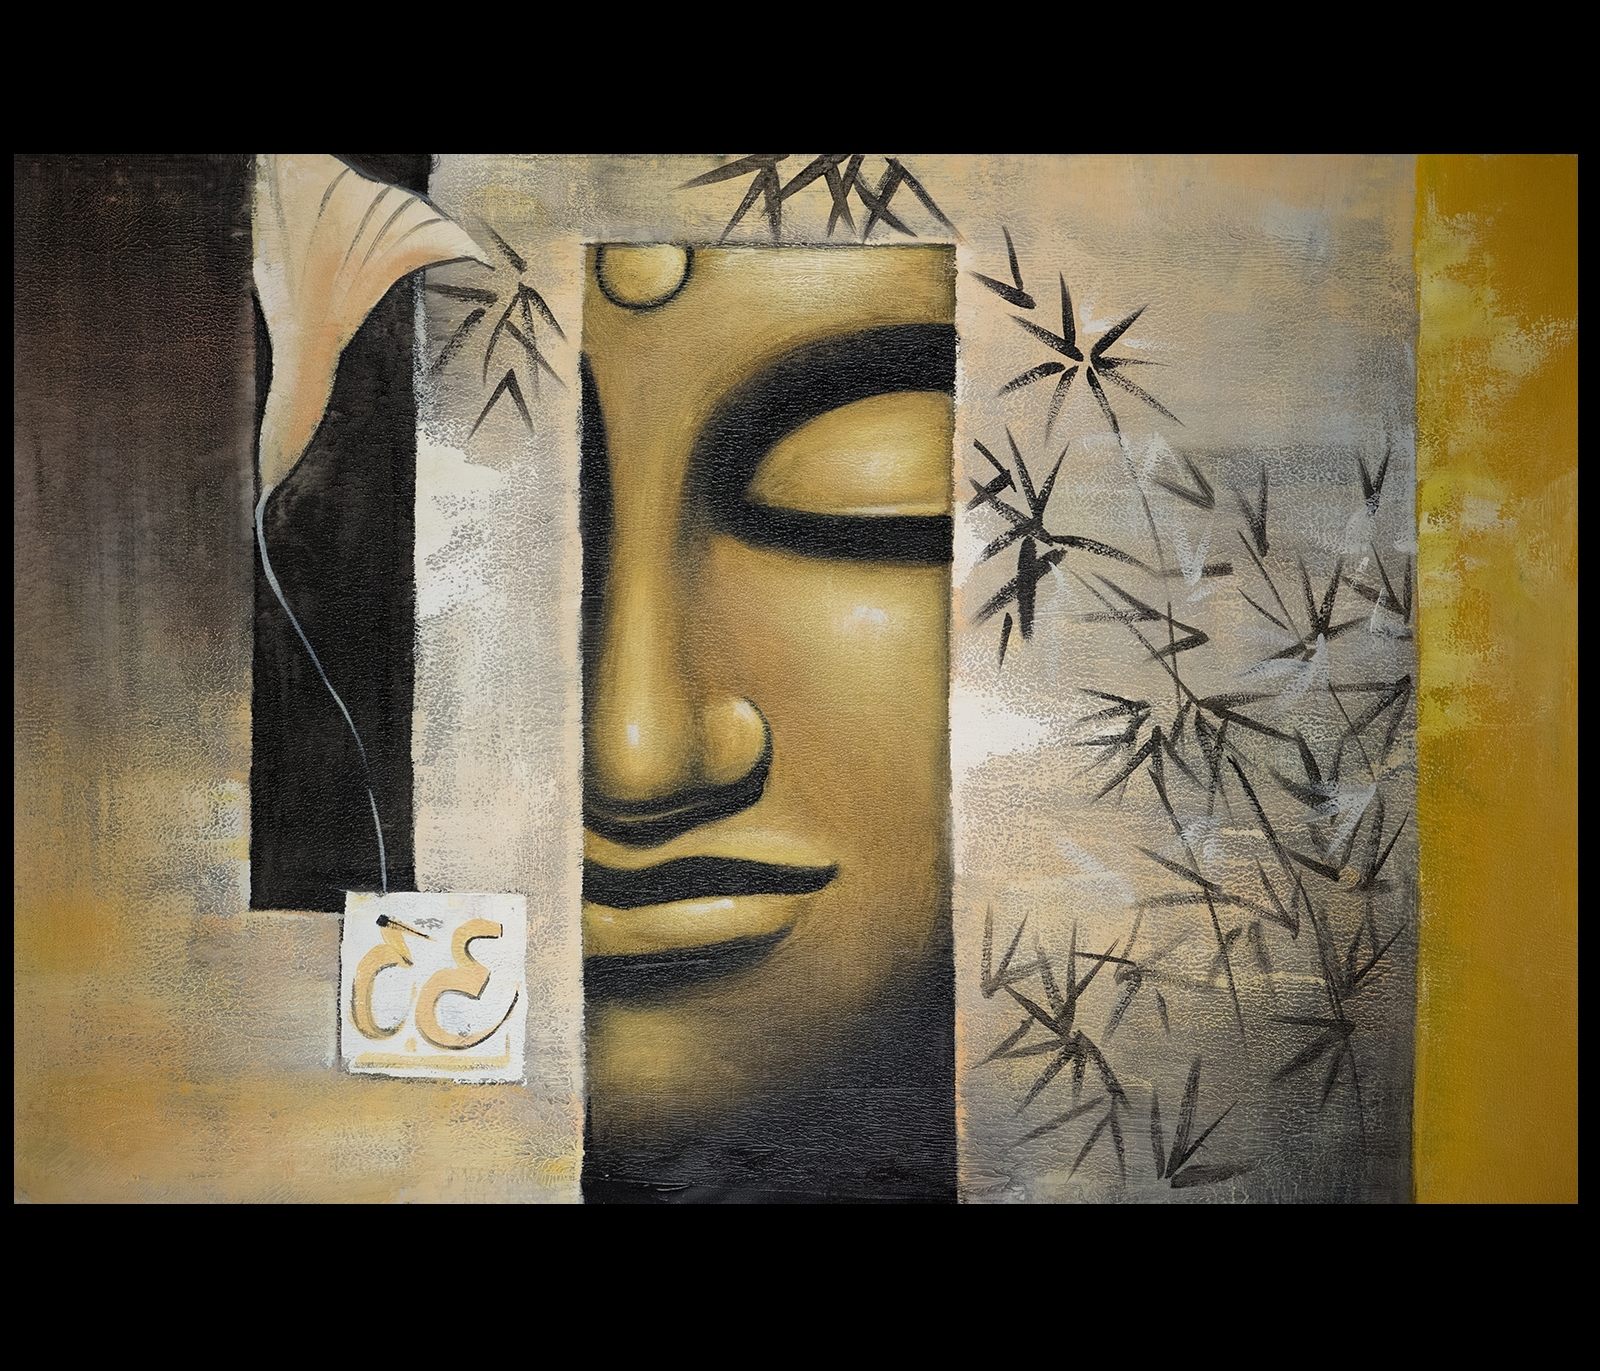 2017 Abstract Buddha Wall Art Throughout B004Hk8Wz4 Canvas Wall Art Modern Contemporary Abstract Art Framed (Gallery 1 of 15)